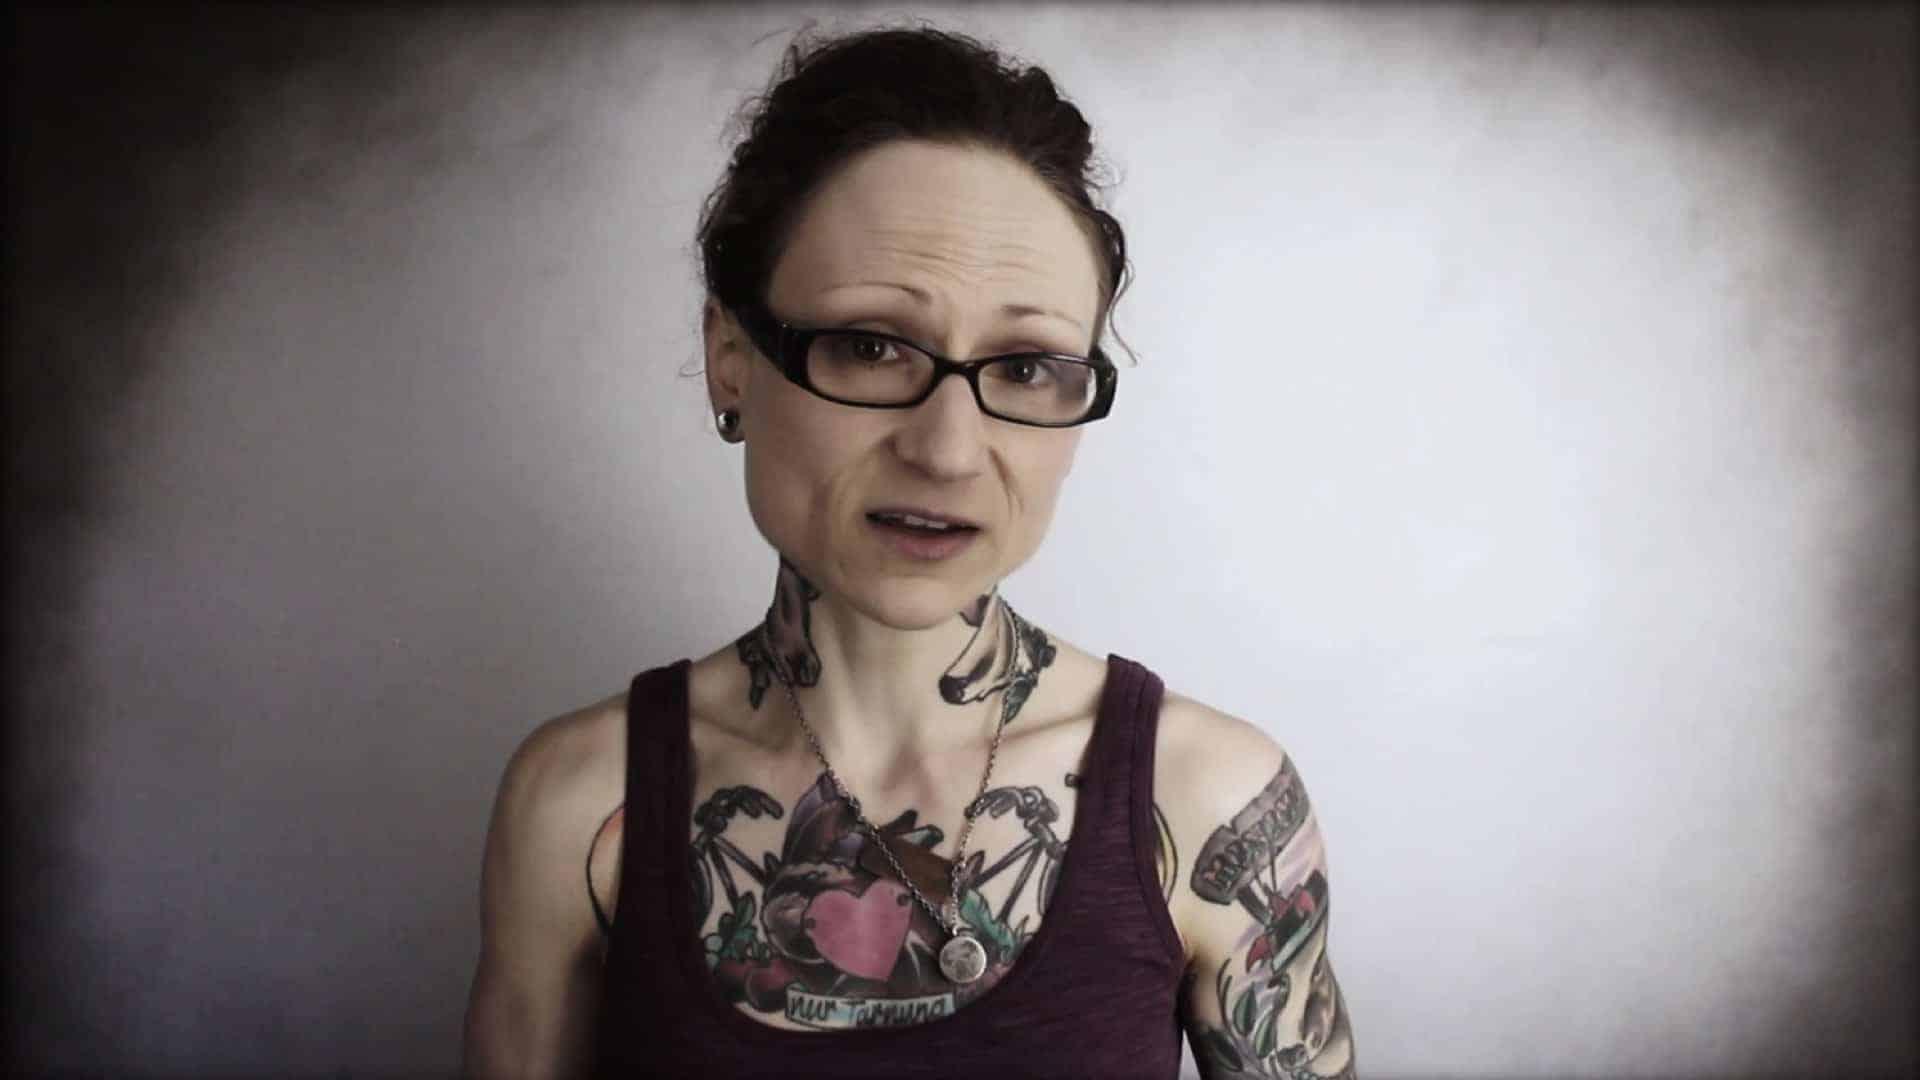 Emily Moran Barwick of Bite Size Vegan is shown looking into the camera.